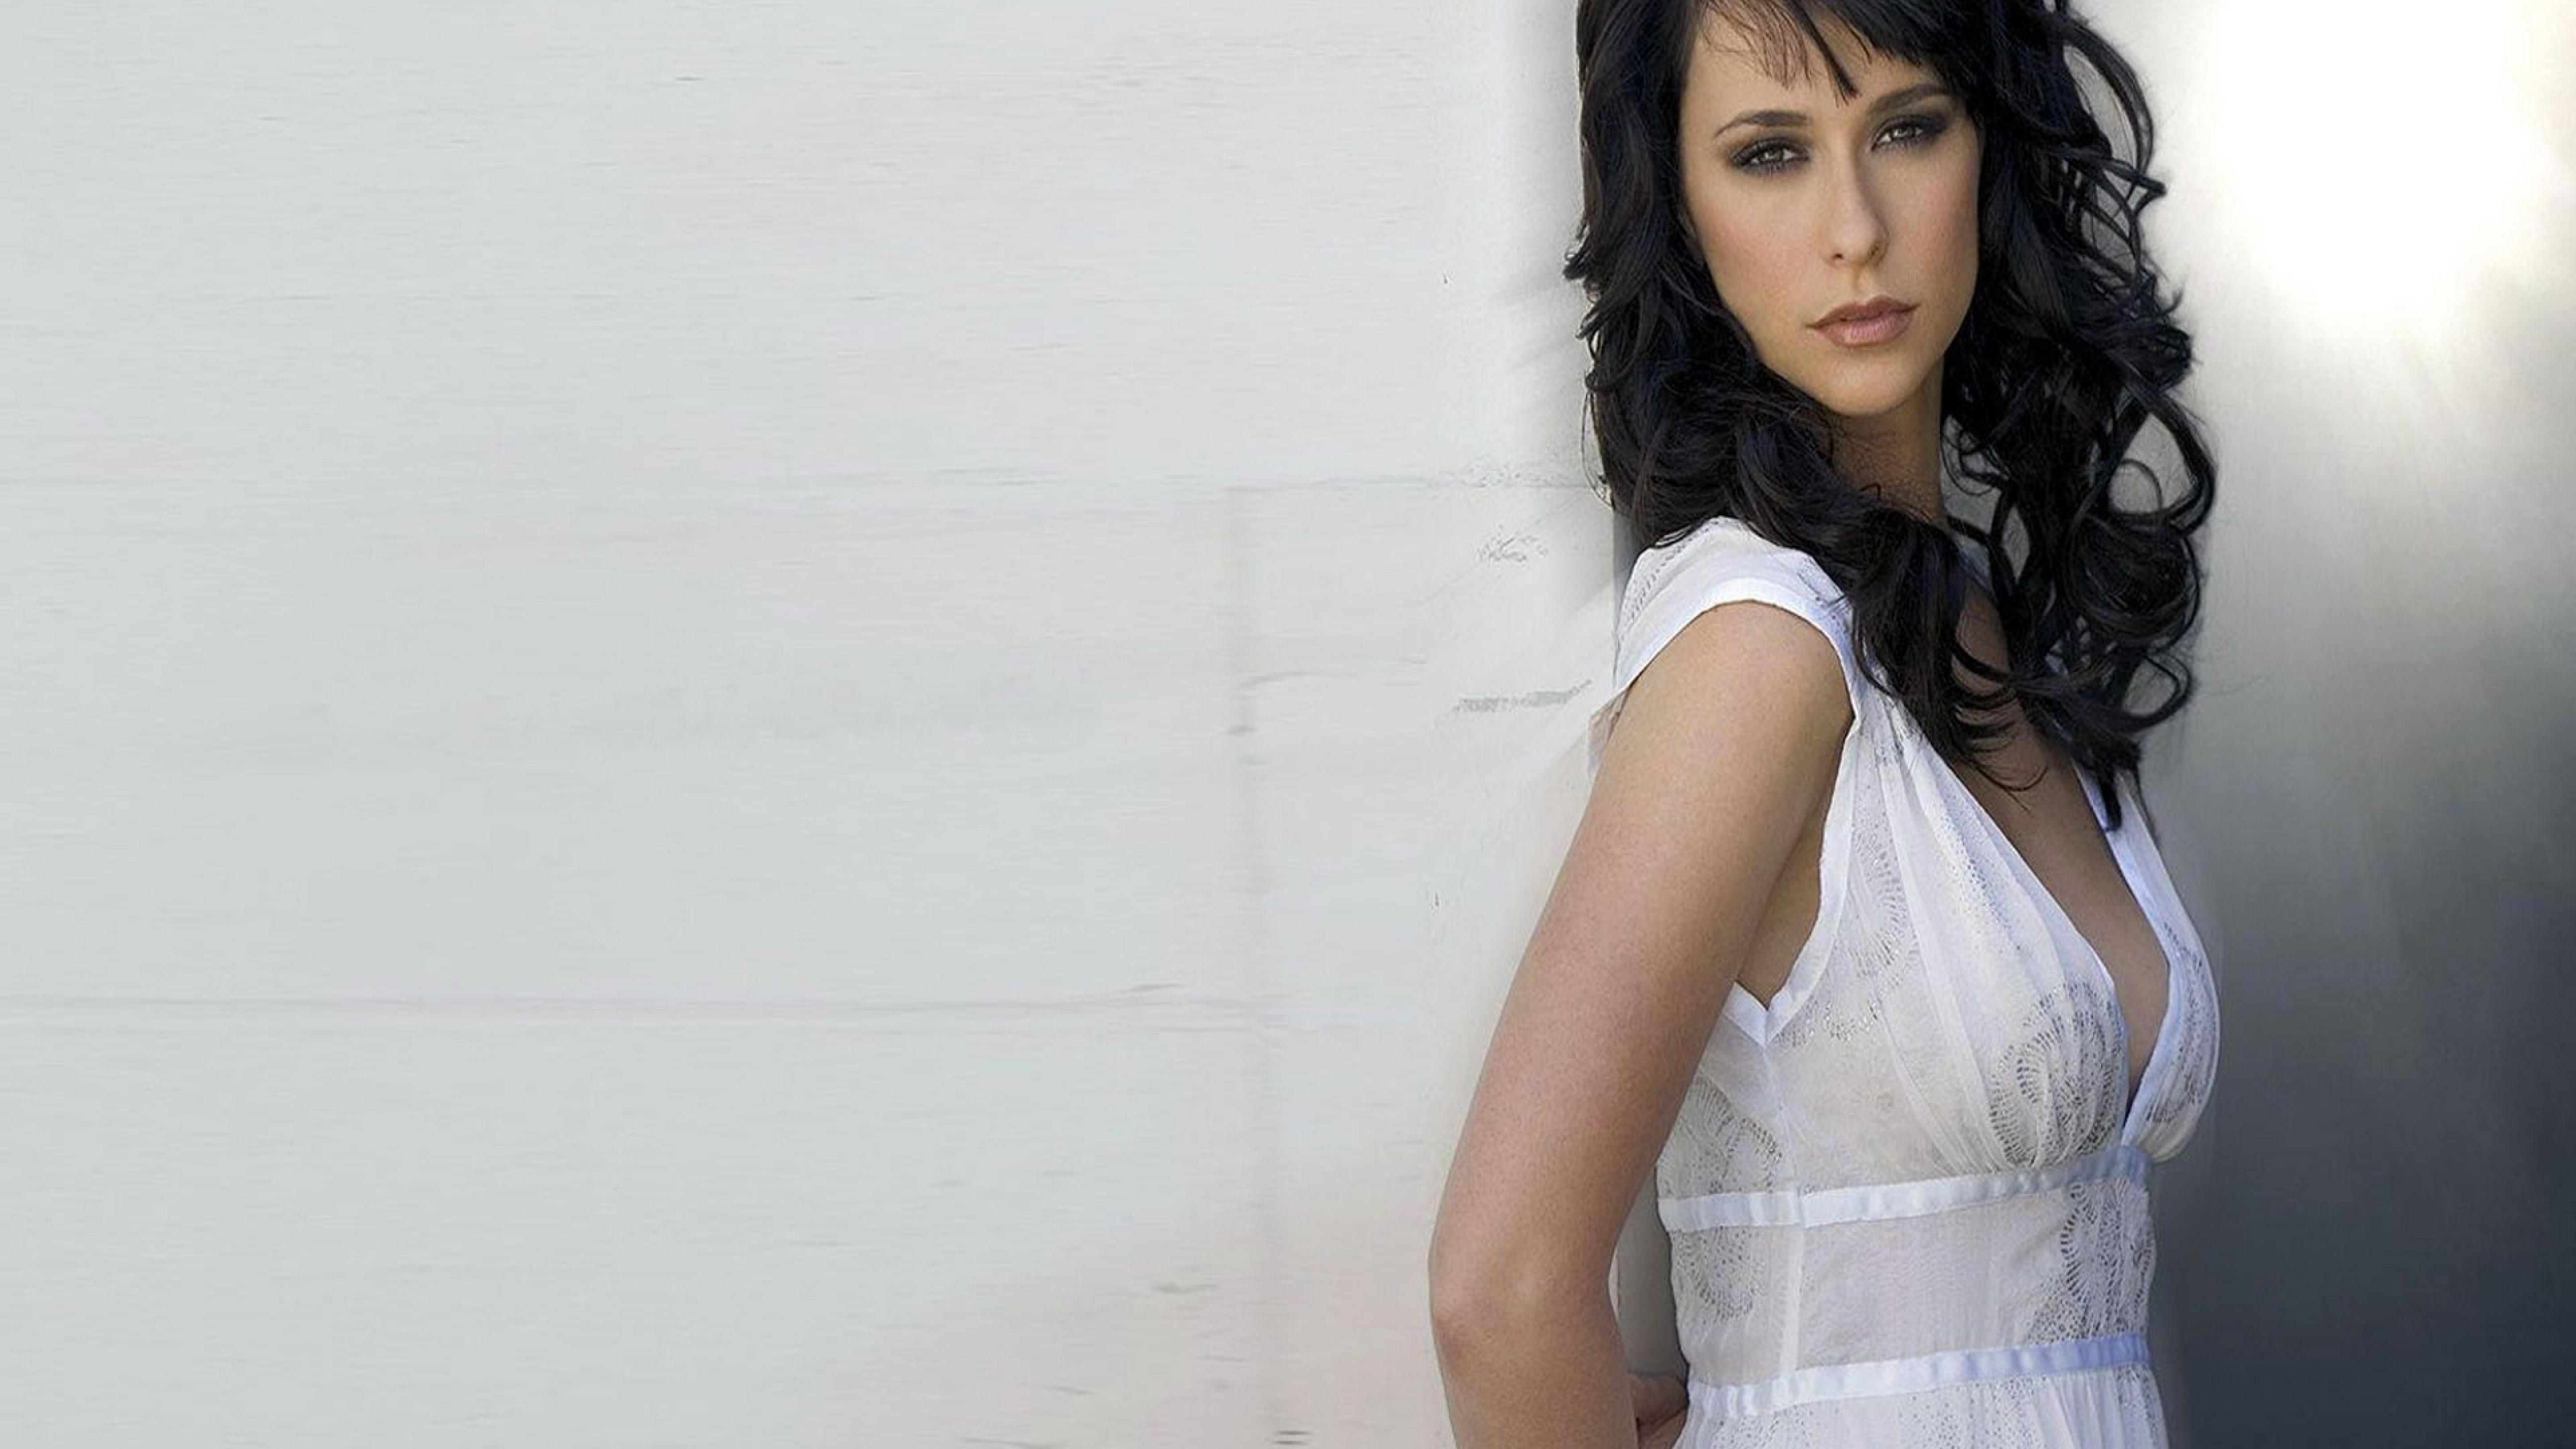 5120x2880 Jennifer Love Hewitt Movie Shooting 5k Wallpaper Hd